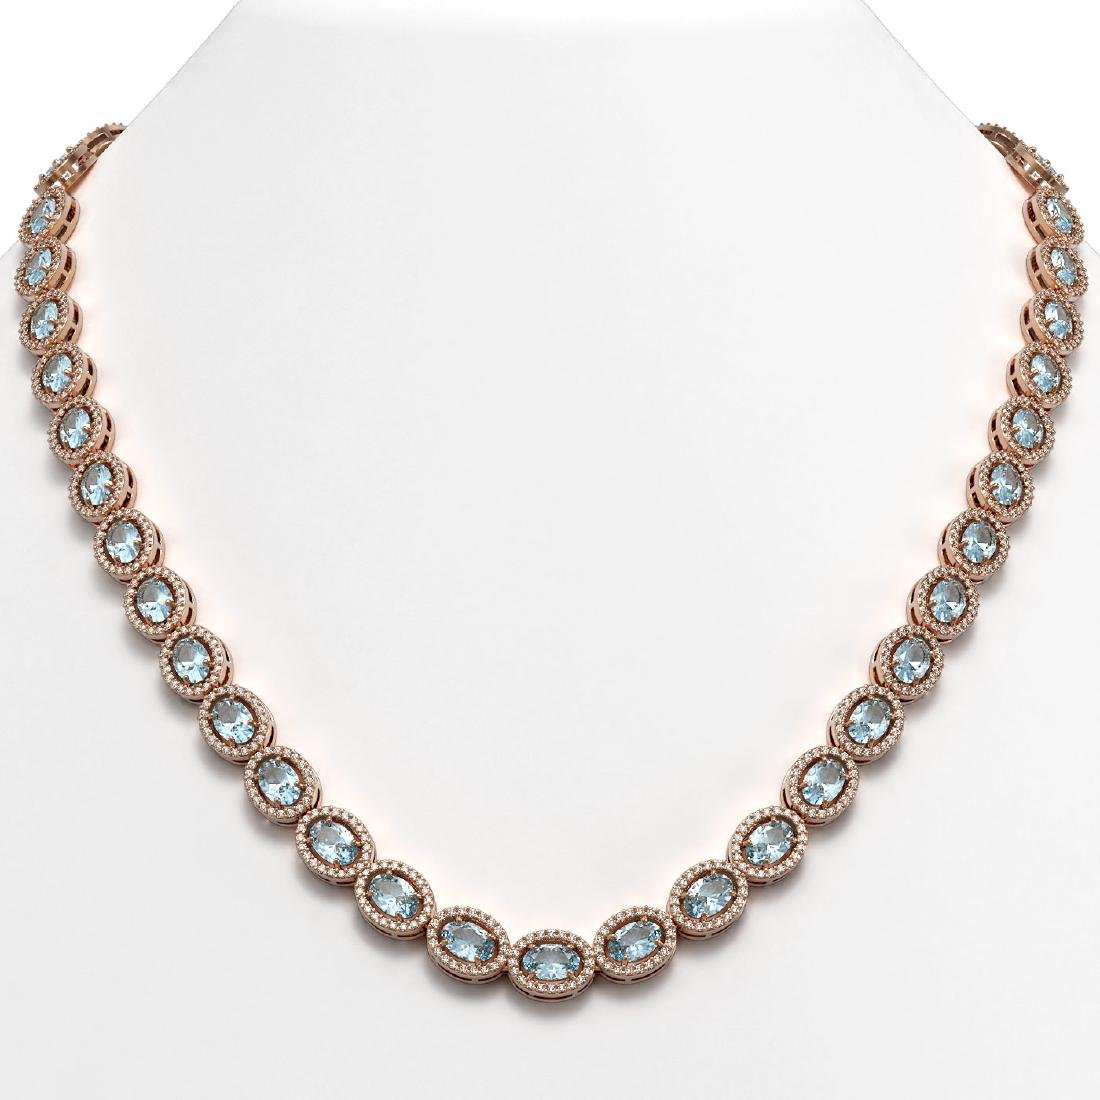 24.65 CTW Aquamarine & Diamond Halo Necklace 10K Rose